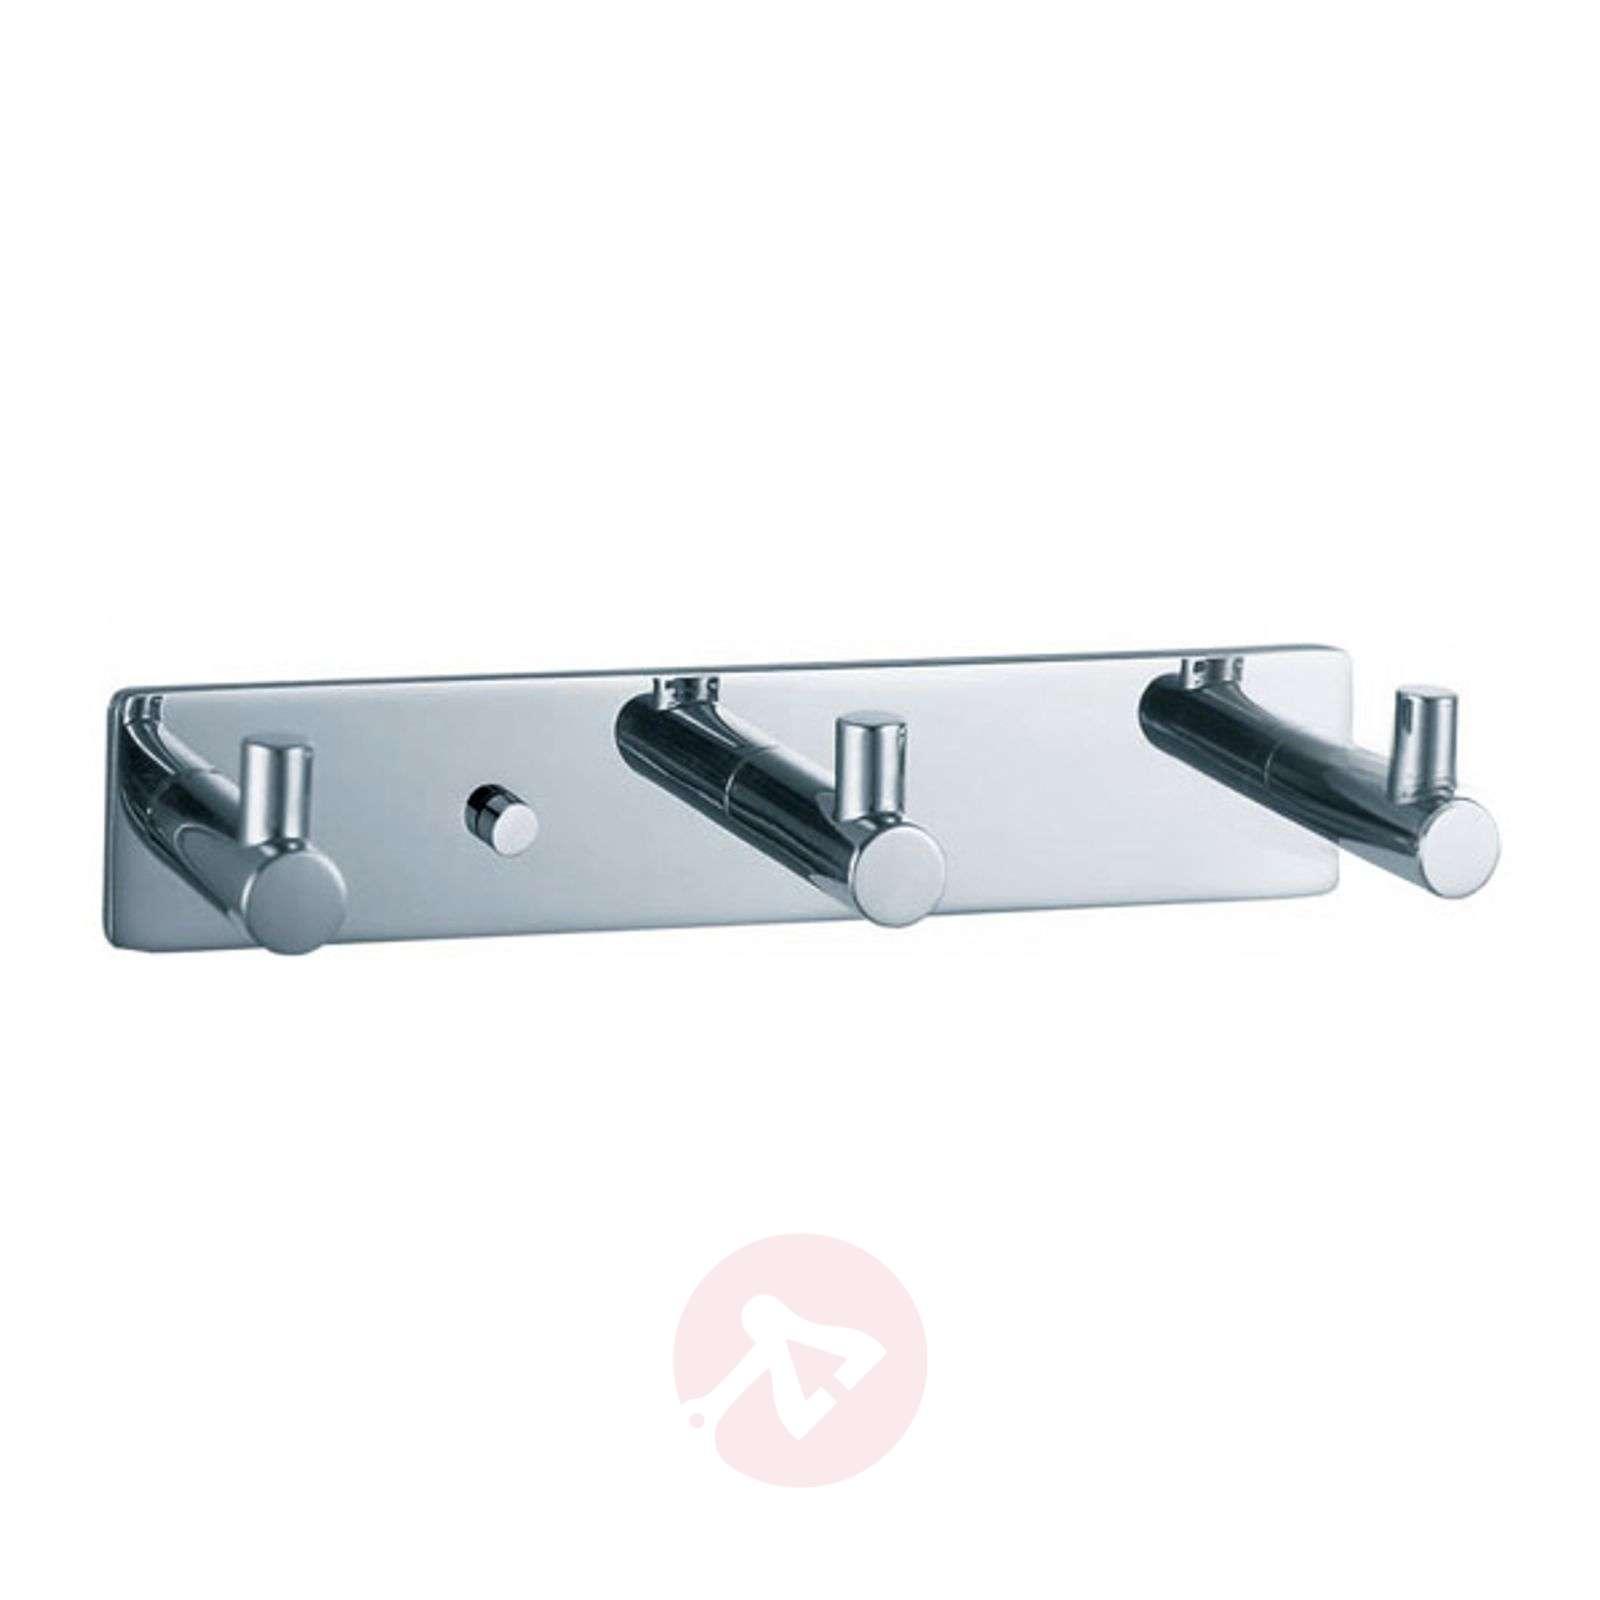 BASIC functional row of hooks-2504486X-01